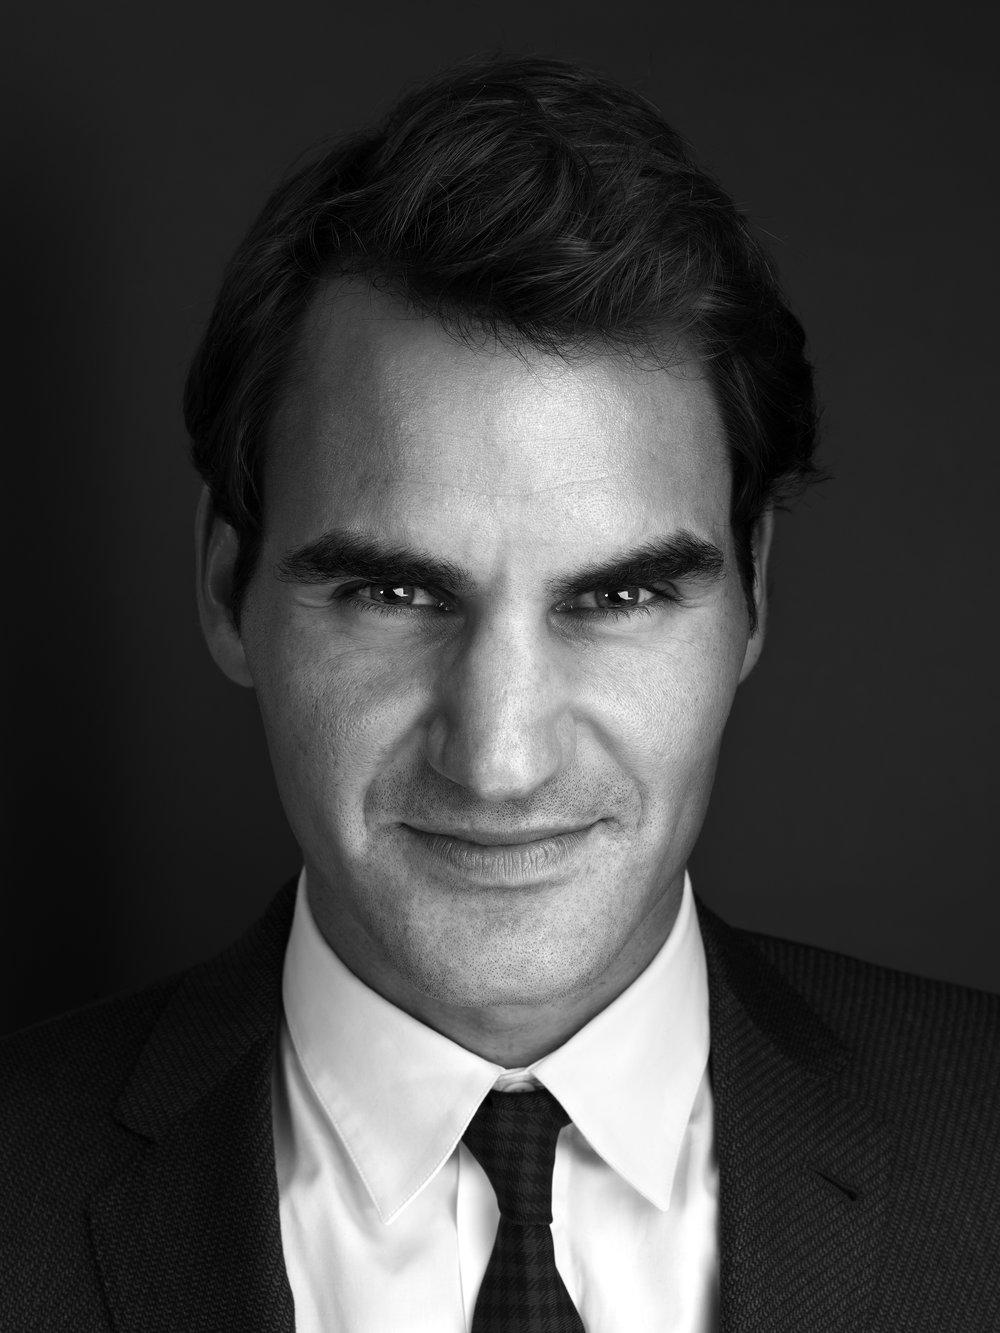 Roger-Federer-by-RemoBuess.jpg